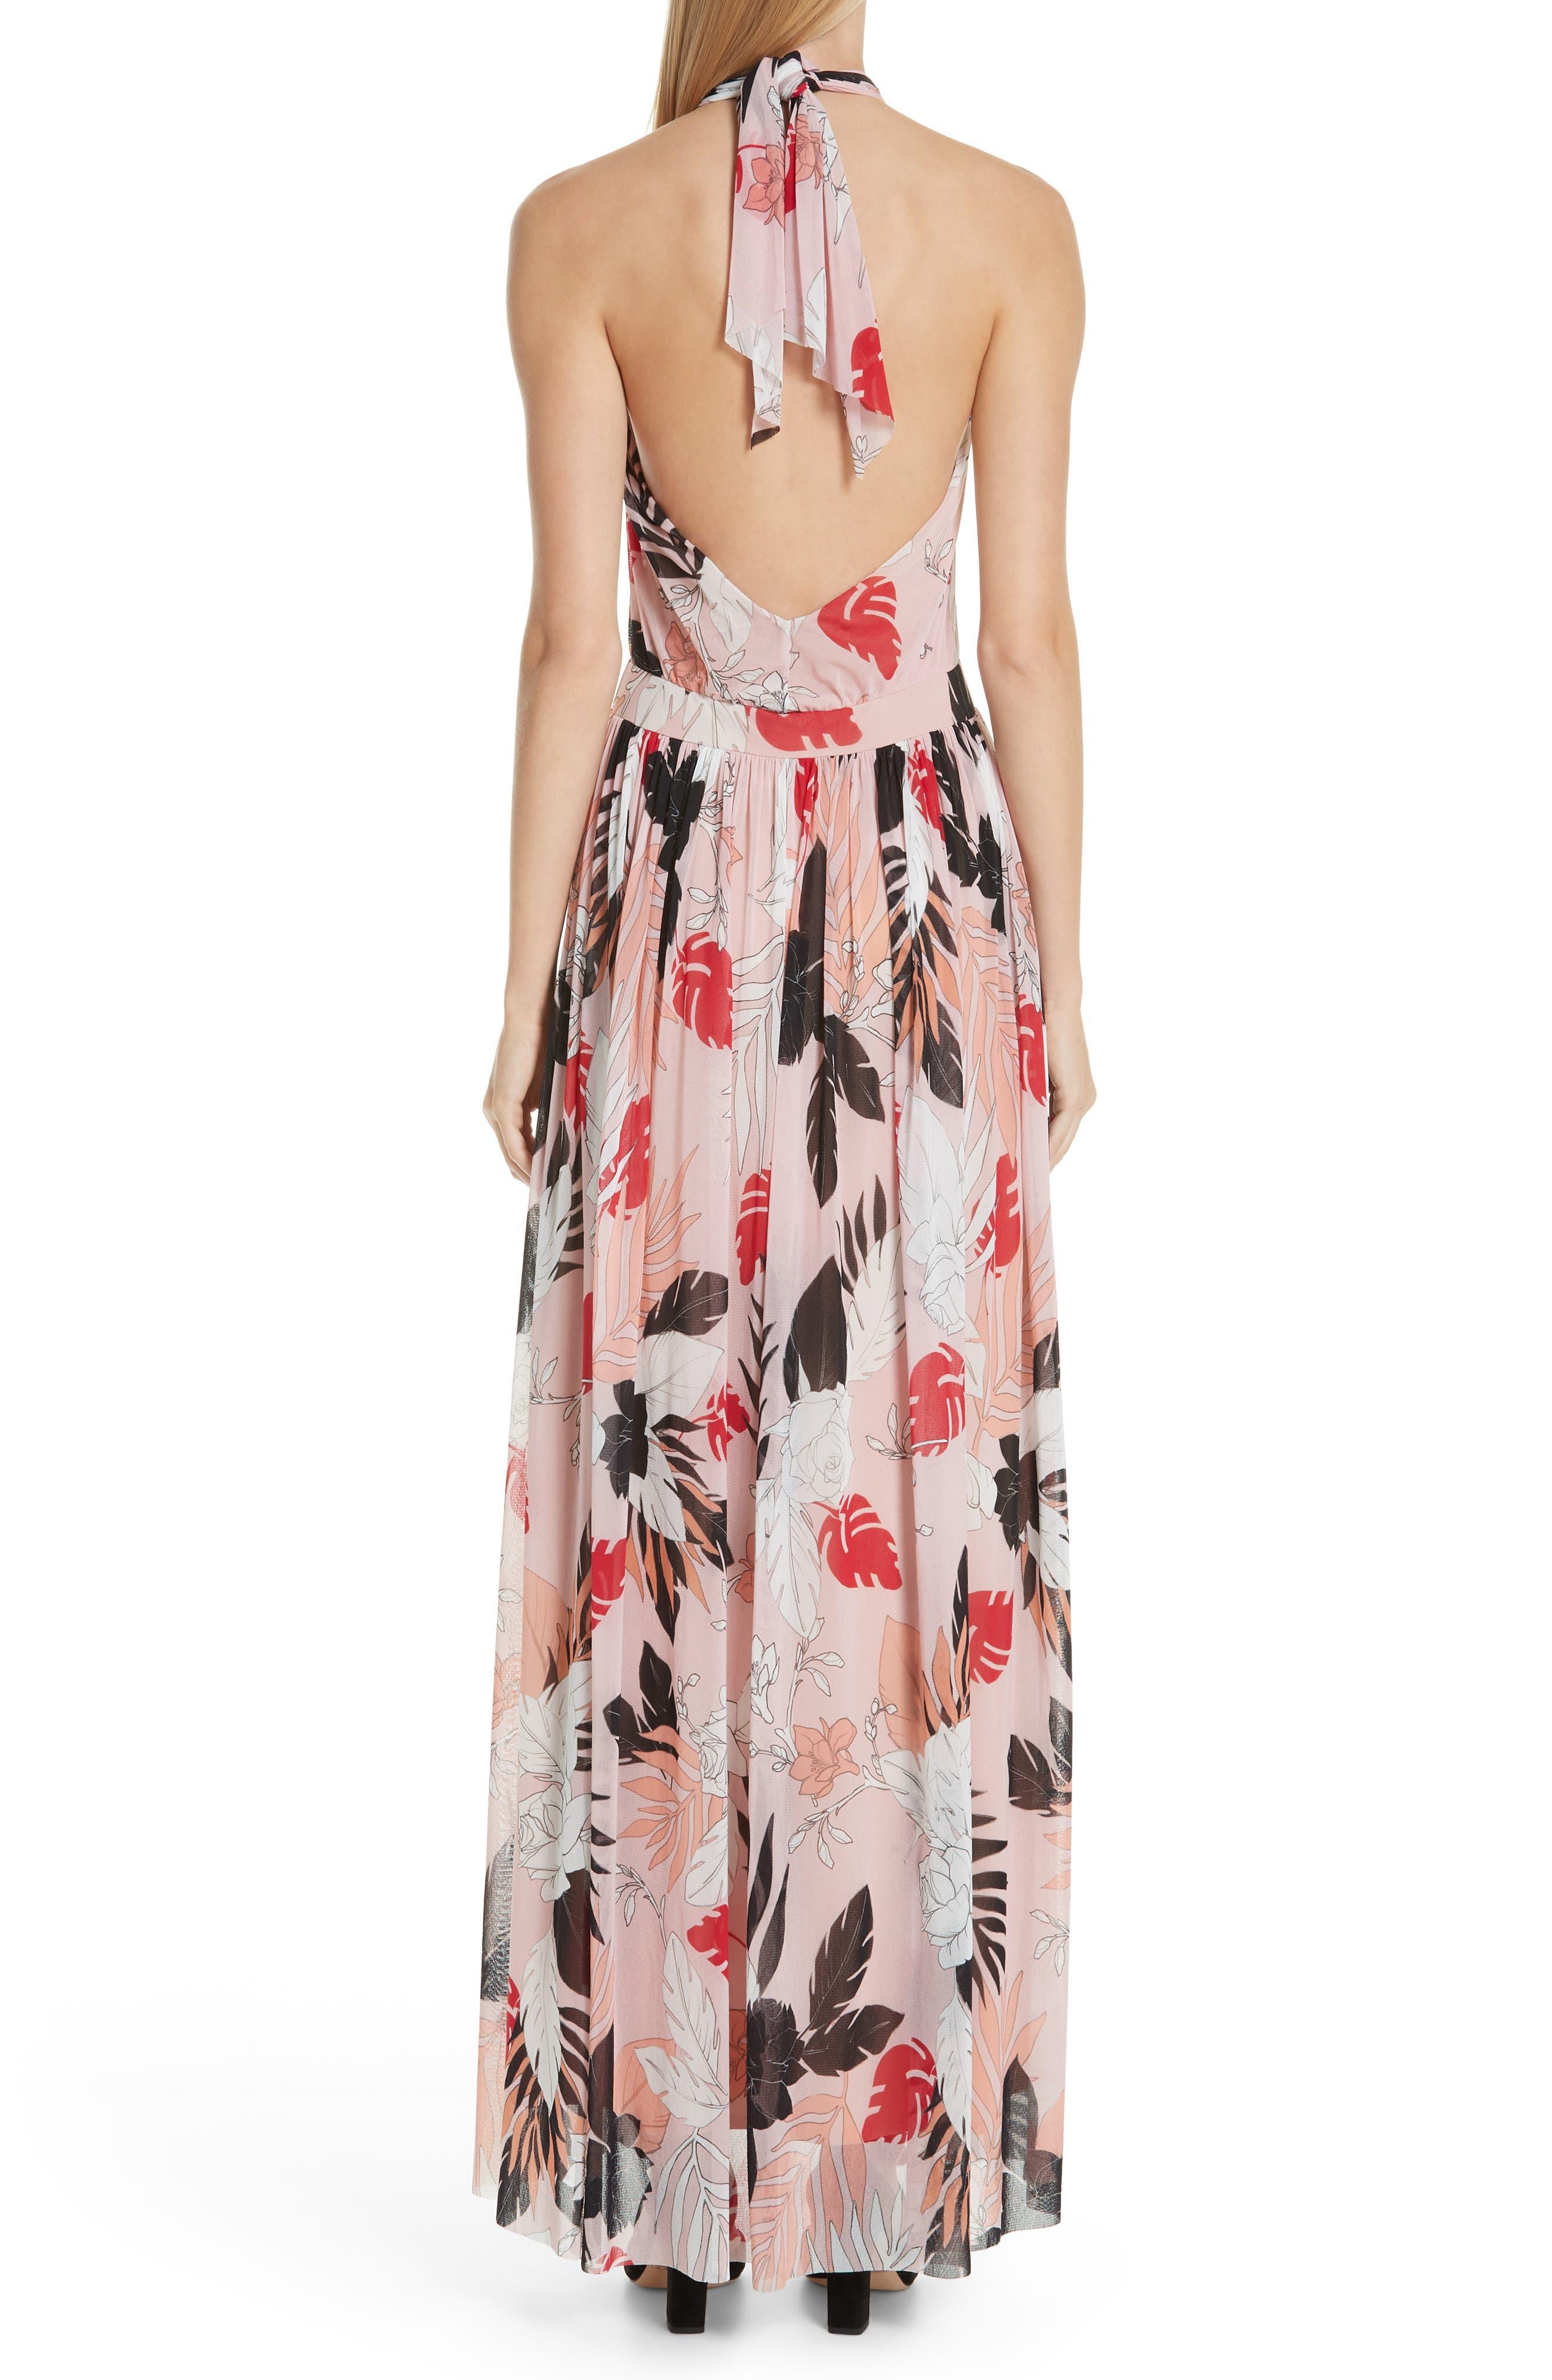 FUZZI, Floral Tulle Cross Halter Maxi Dress, Alternate thumbnail 2, color, ALBA